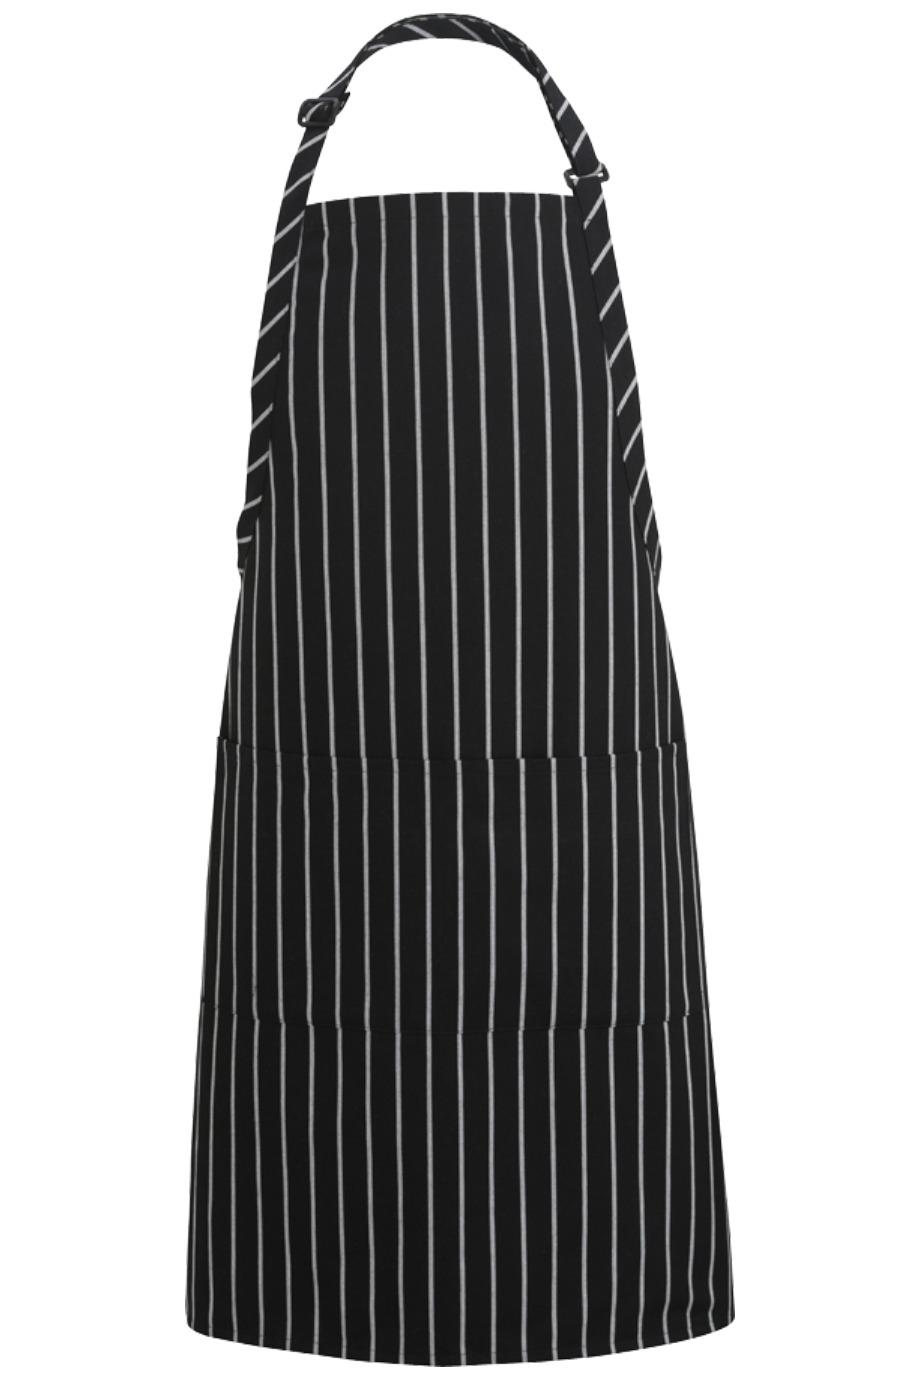 9015 Edwards 2-Pocket Butcher Apron